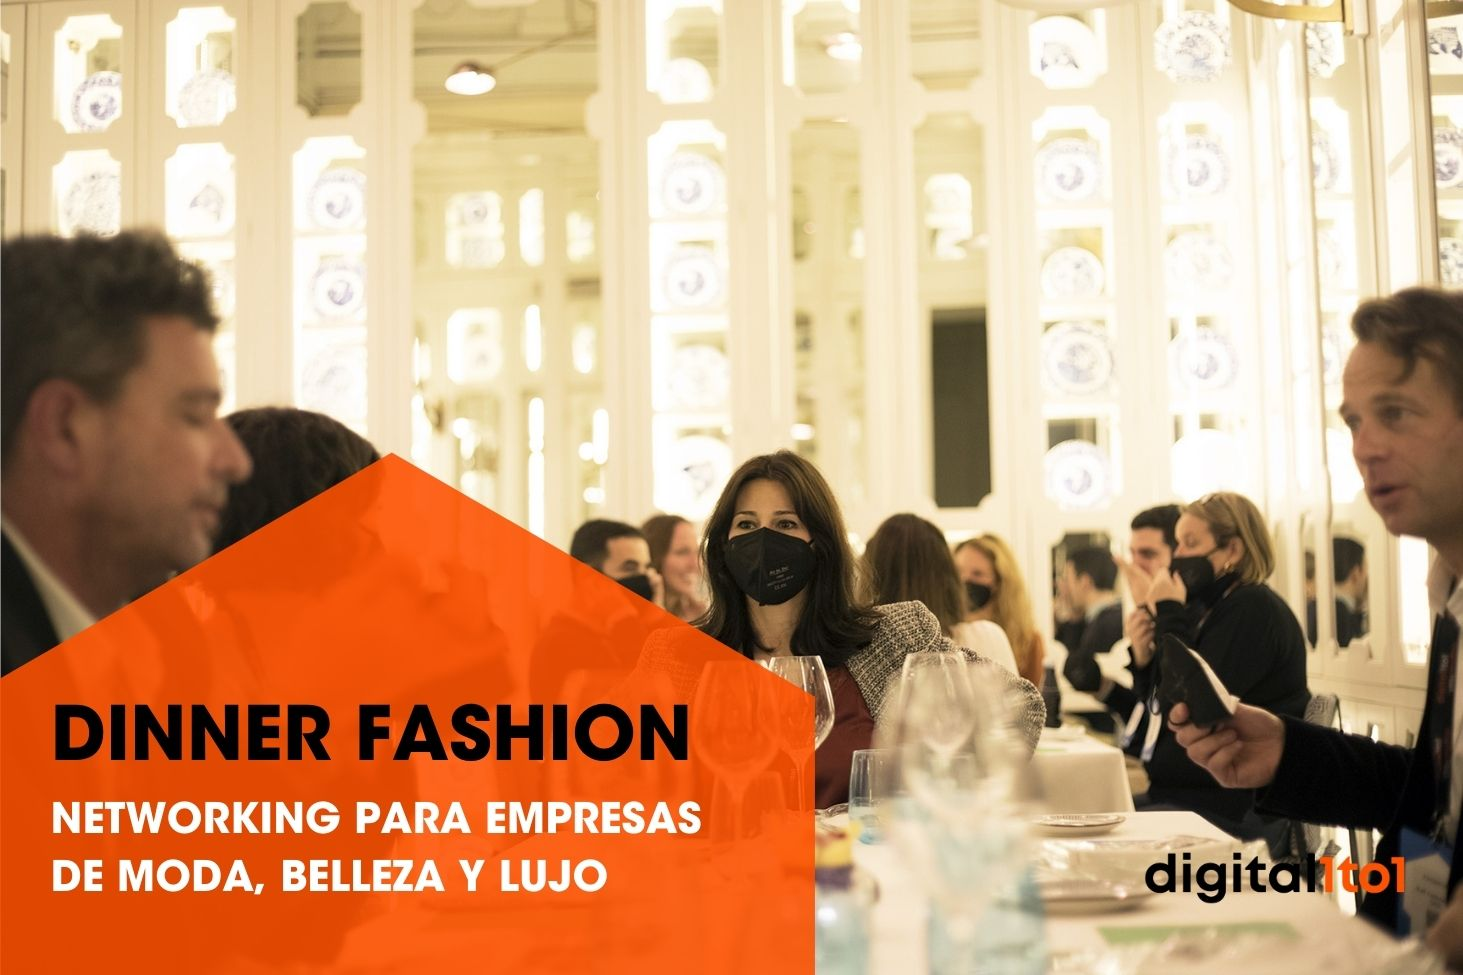 dinner fashion networking empresas moda belleza lujo